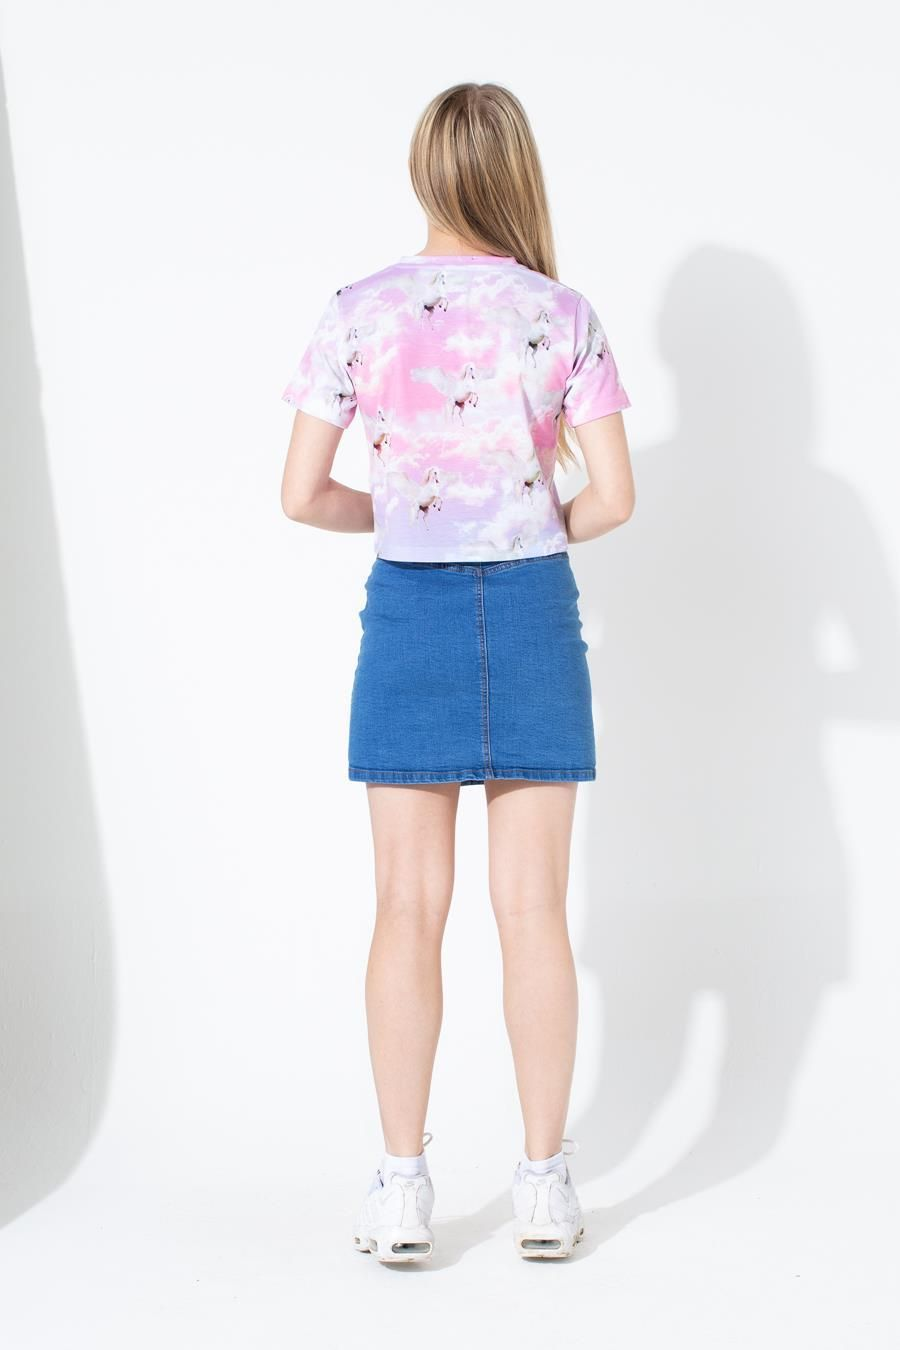 Hype Unicorn Skies Kids Crop T-Shirt